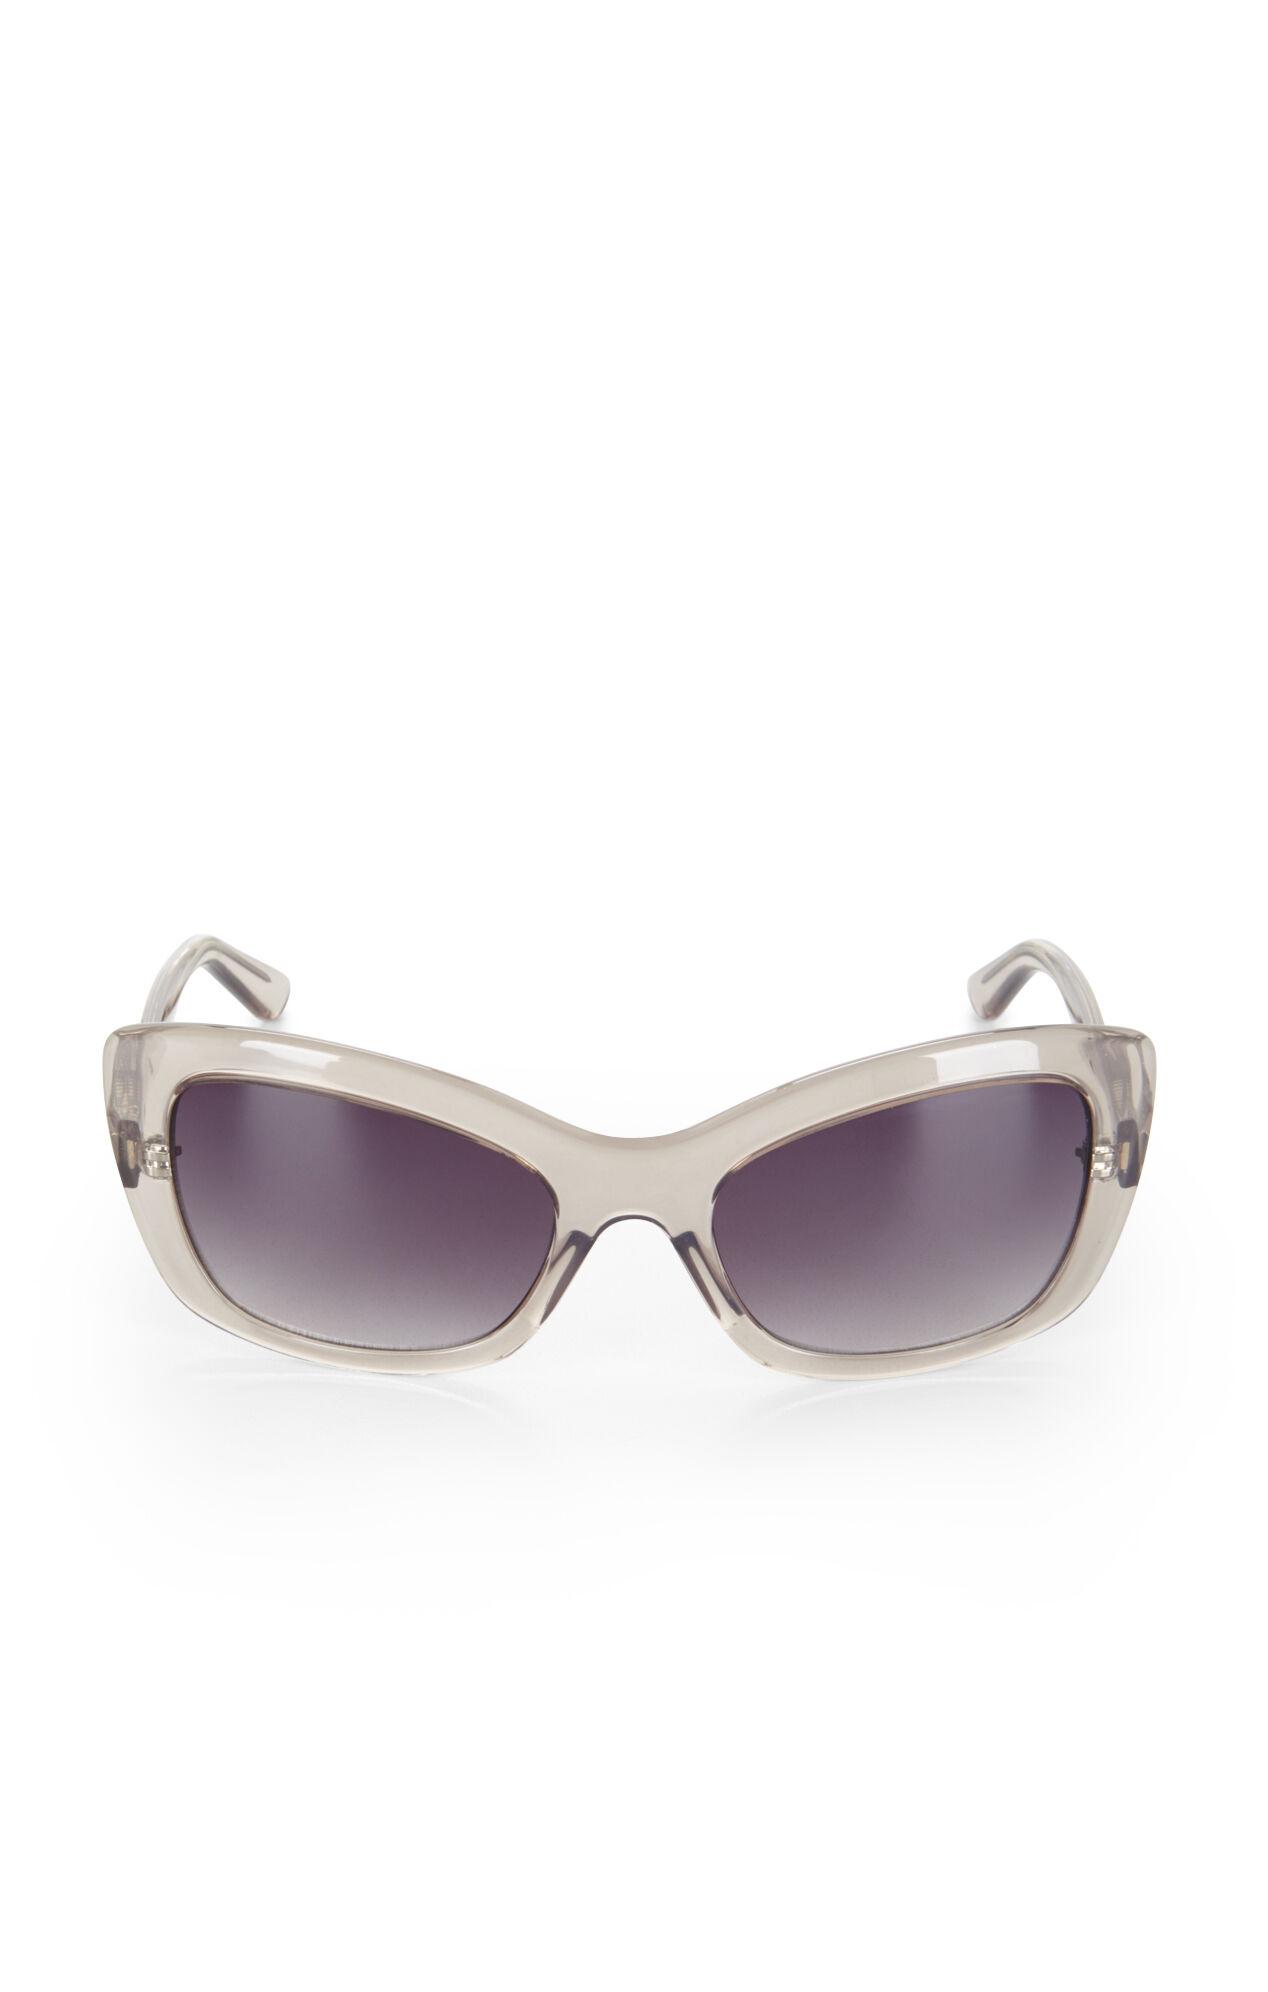 Clear Cat-Eye Sunglasses